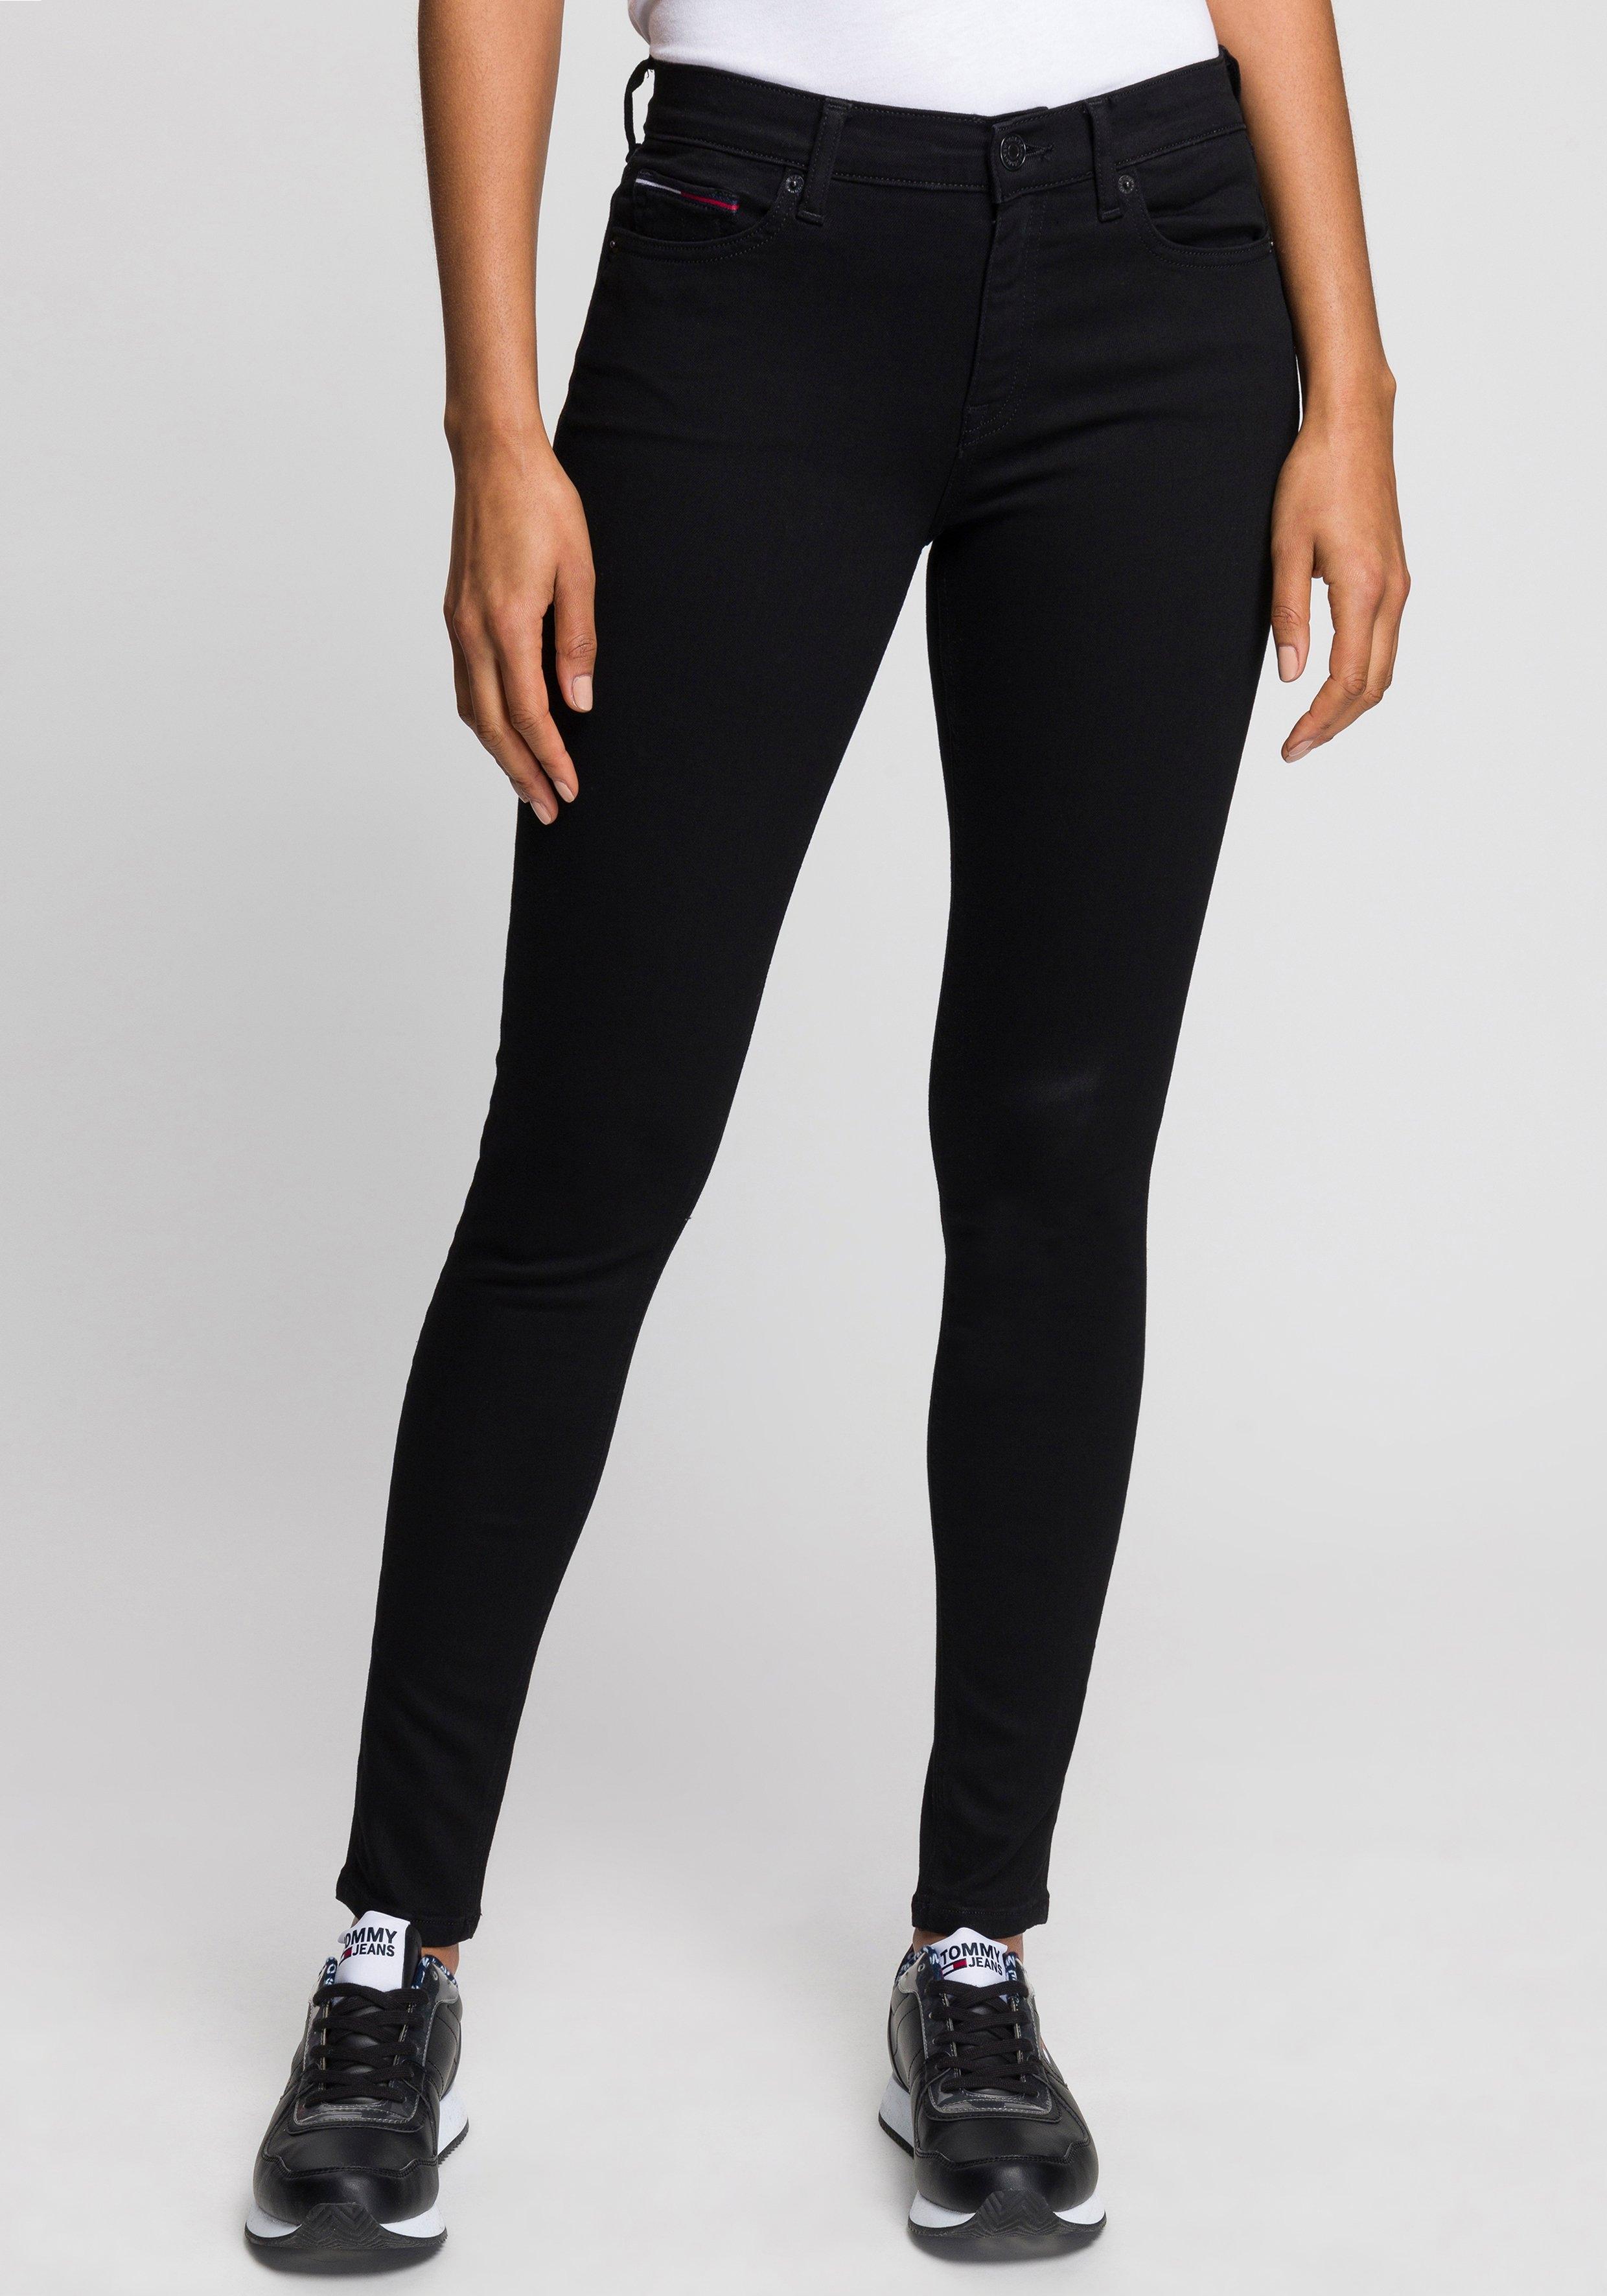 TOMMY JEANS Skinny fit jeans NORA MR SKNY met tommy jeans-logobadge & borduursels nu online kopen bij OTTO